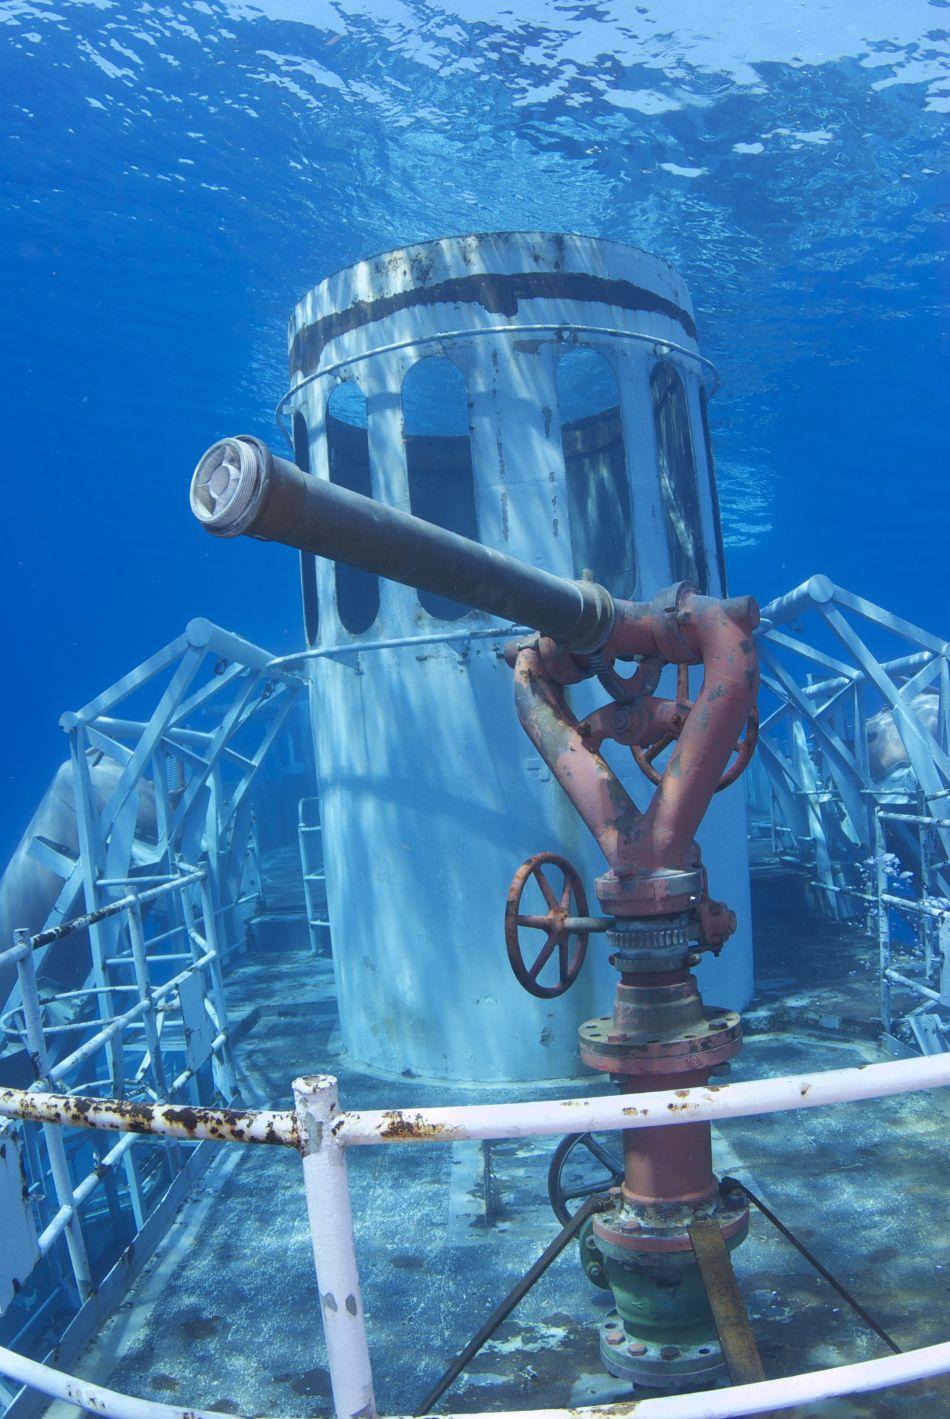 Water canon on the Kittiwake